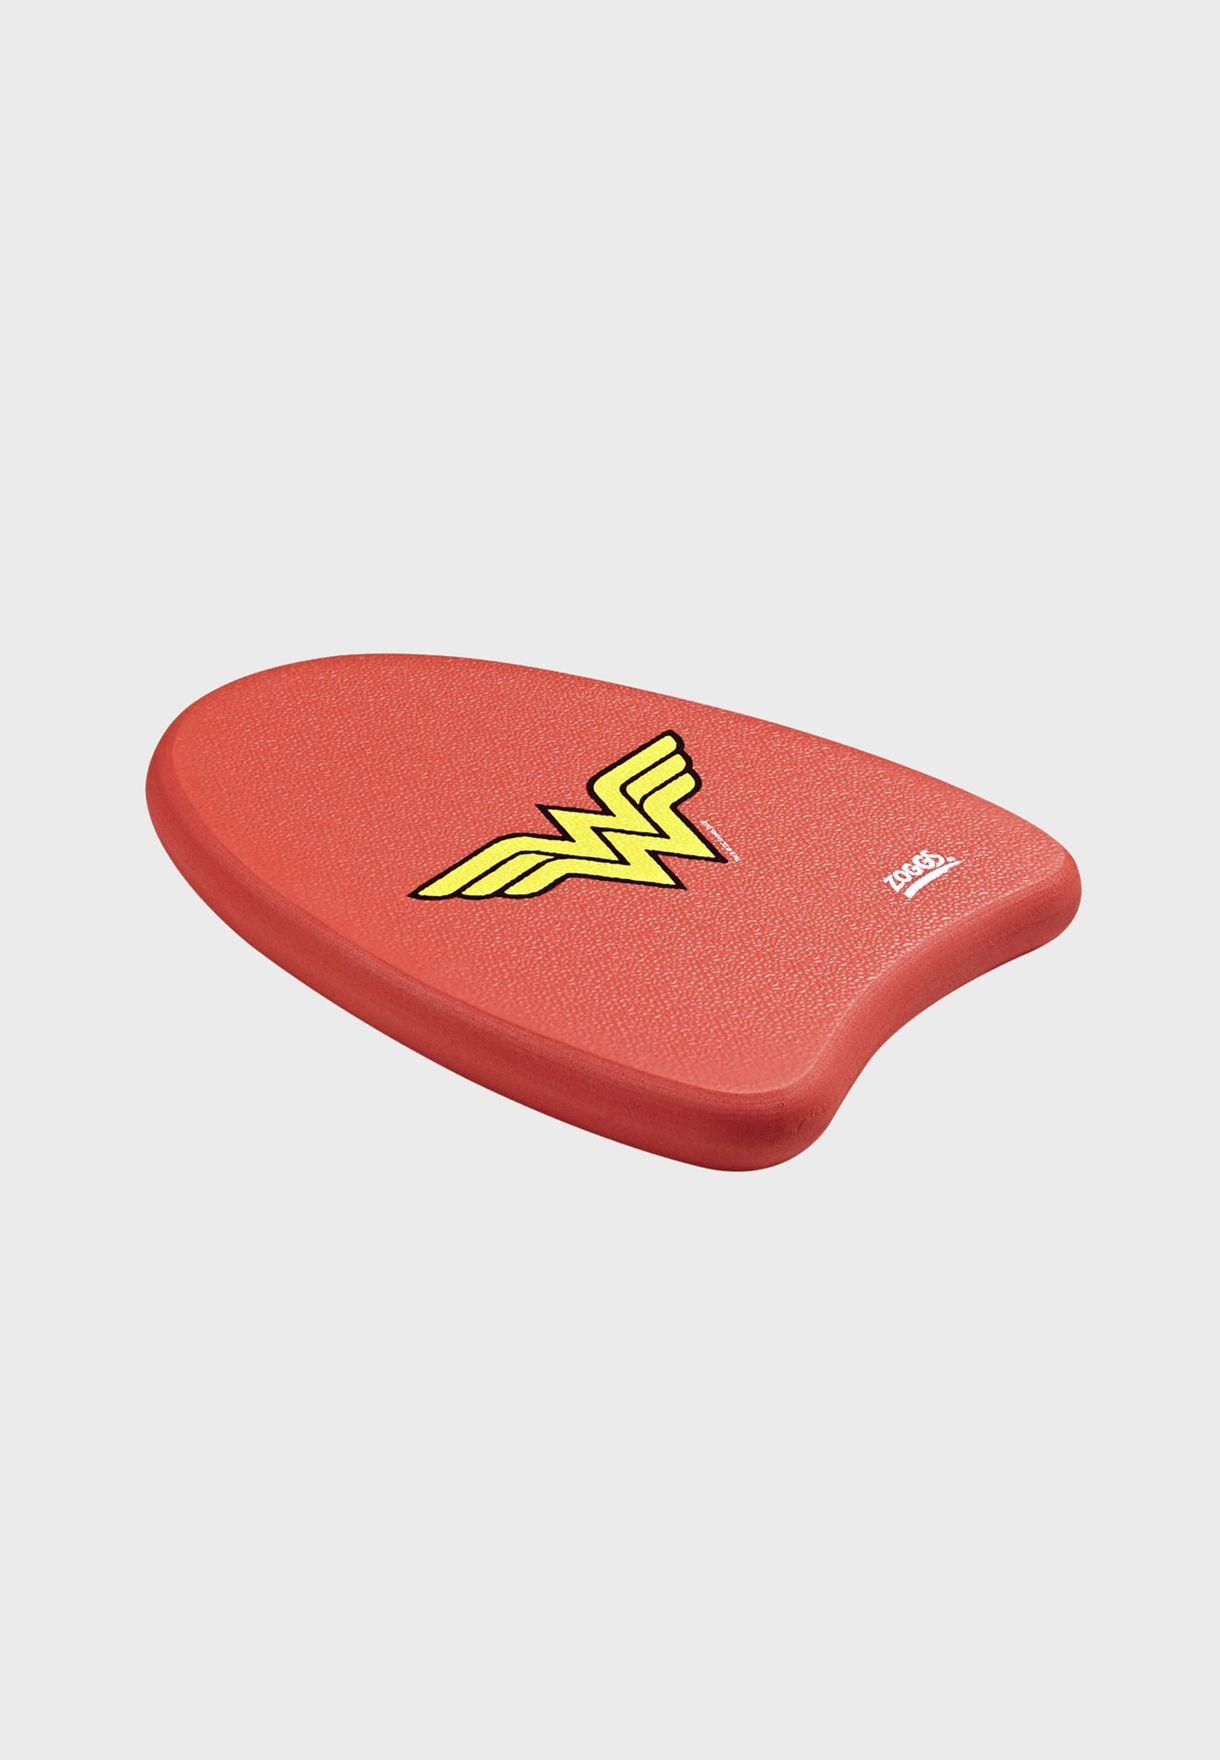 Youth Wonder Woman Mini Kickboard